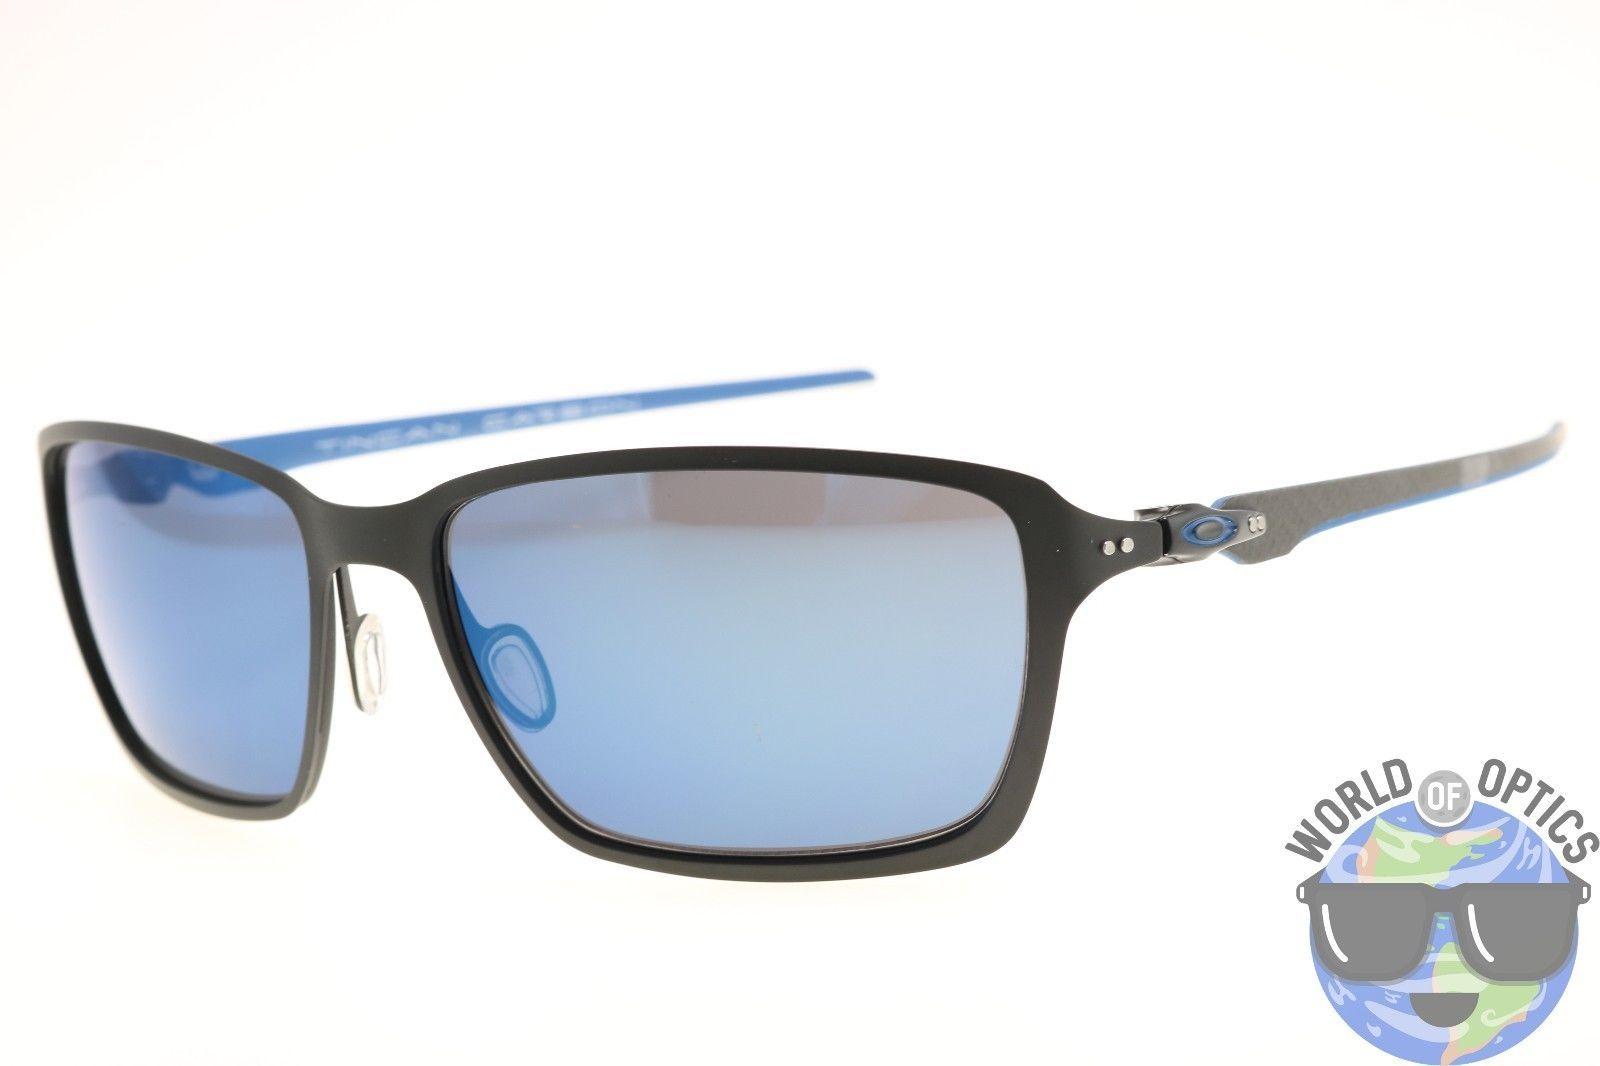 b50fb5df61a50 Oakley Tincan Carbon Sunglasses OO6017-04 Matte Black w  Ice Iridium Lenses